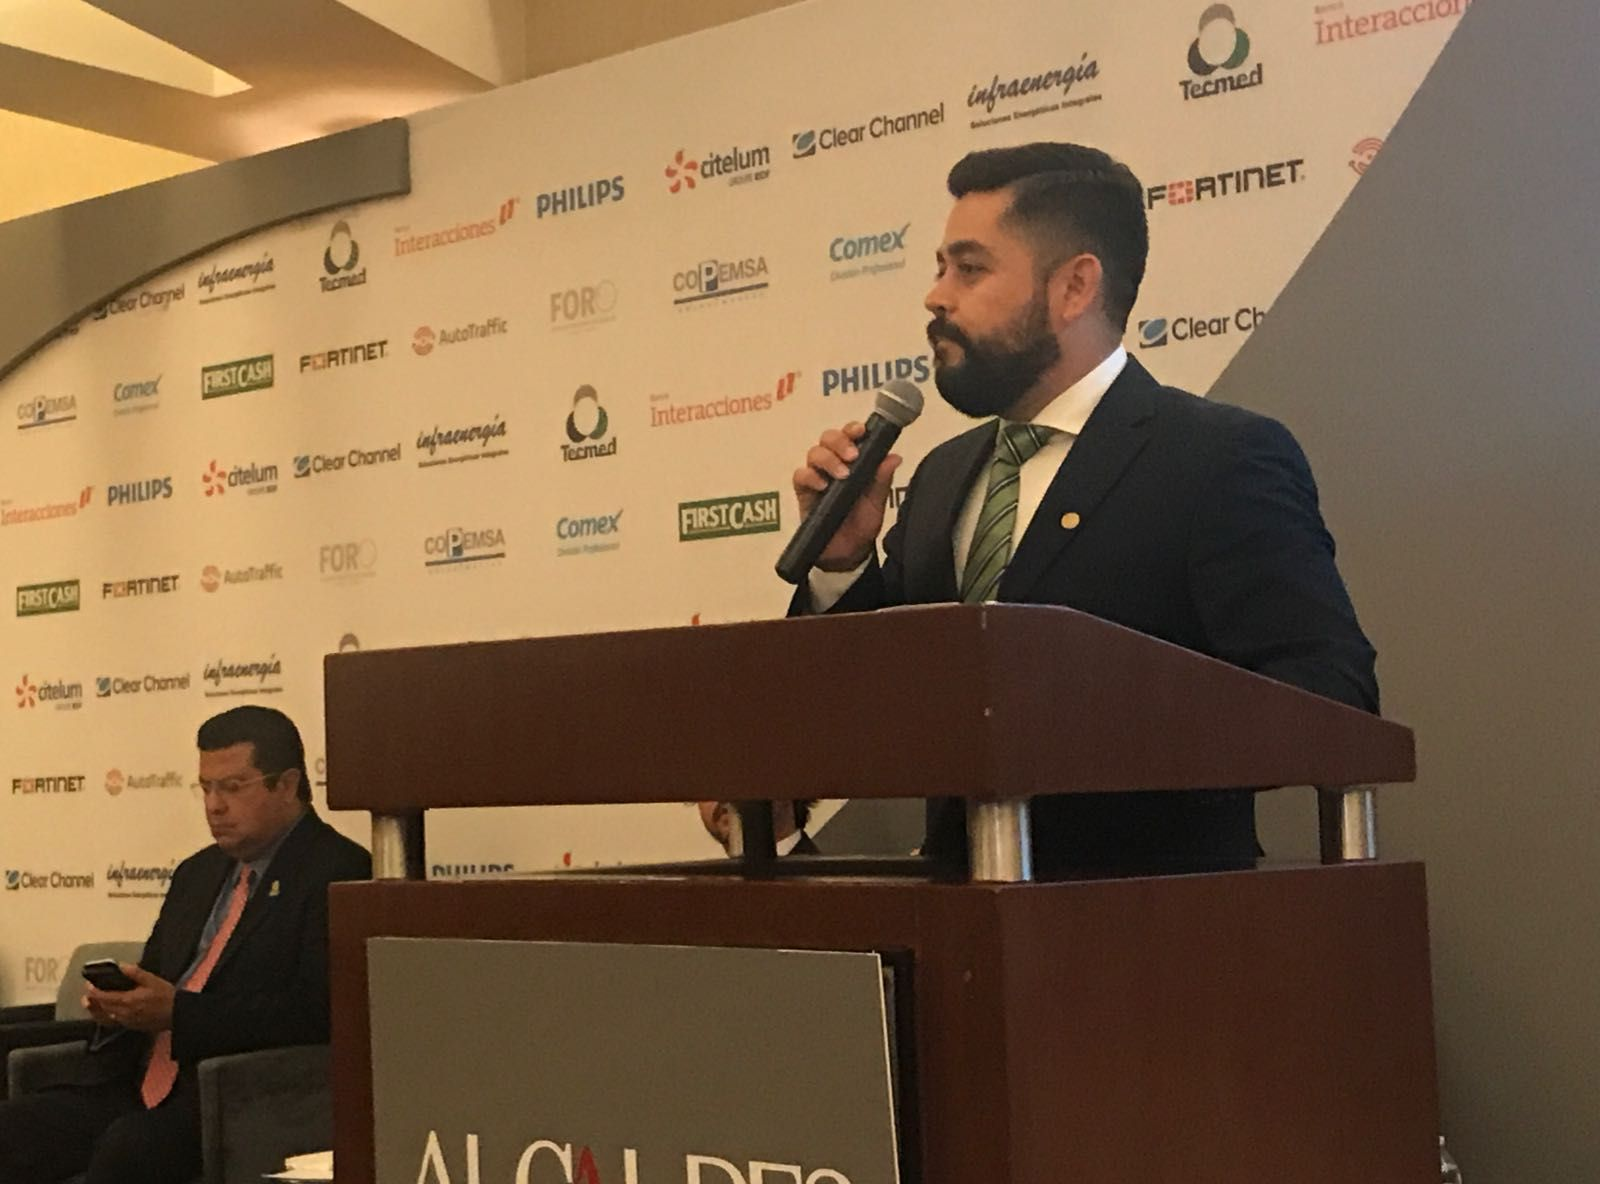 Foto de José Ortiz, Director Regional de Citelum México.